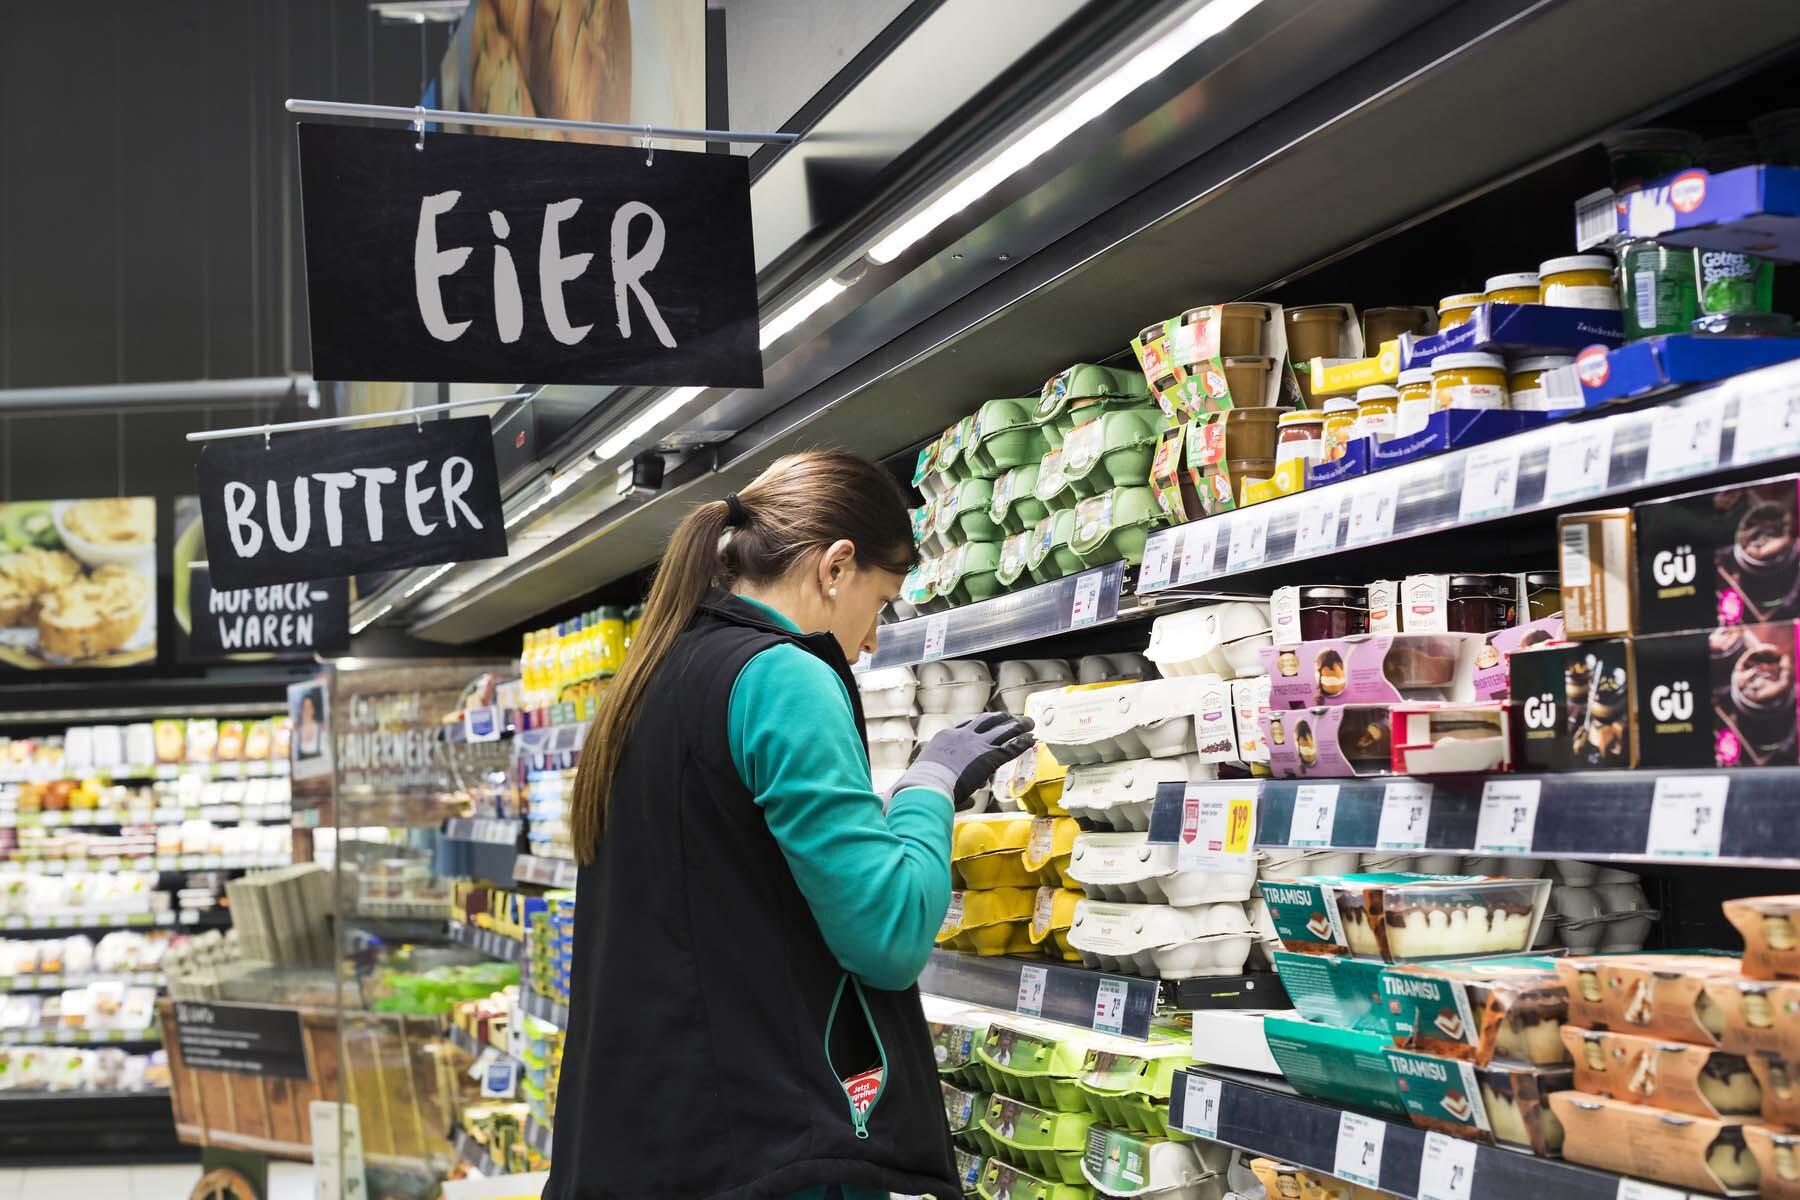 Austrian grocery store